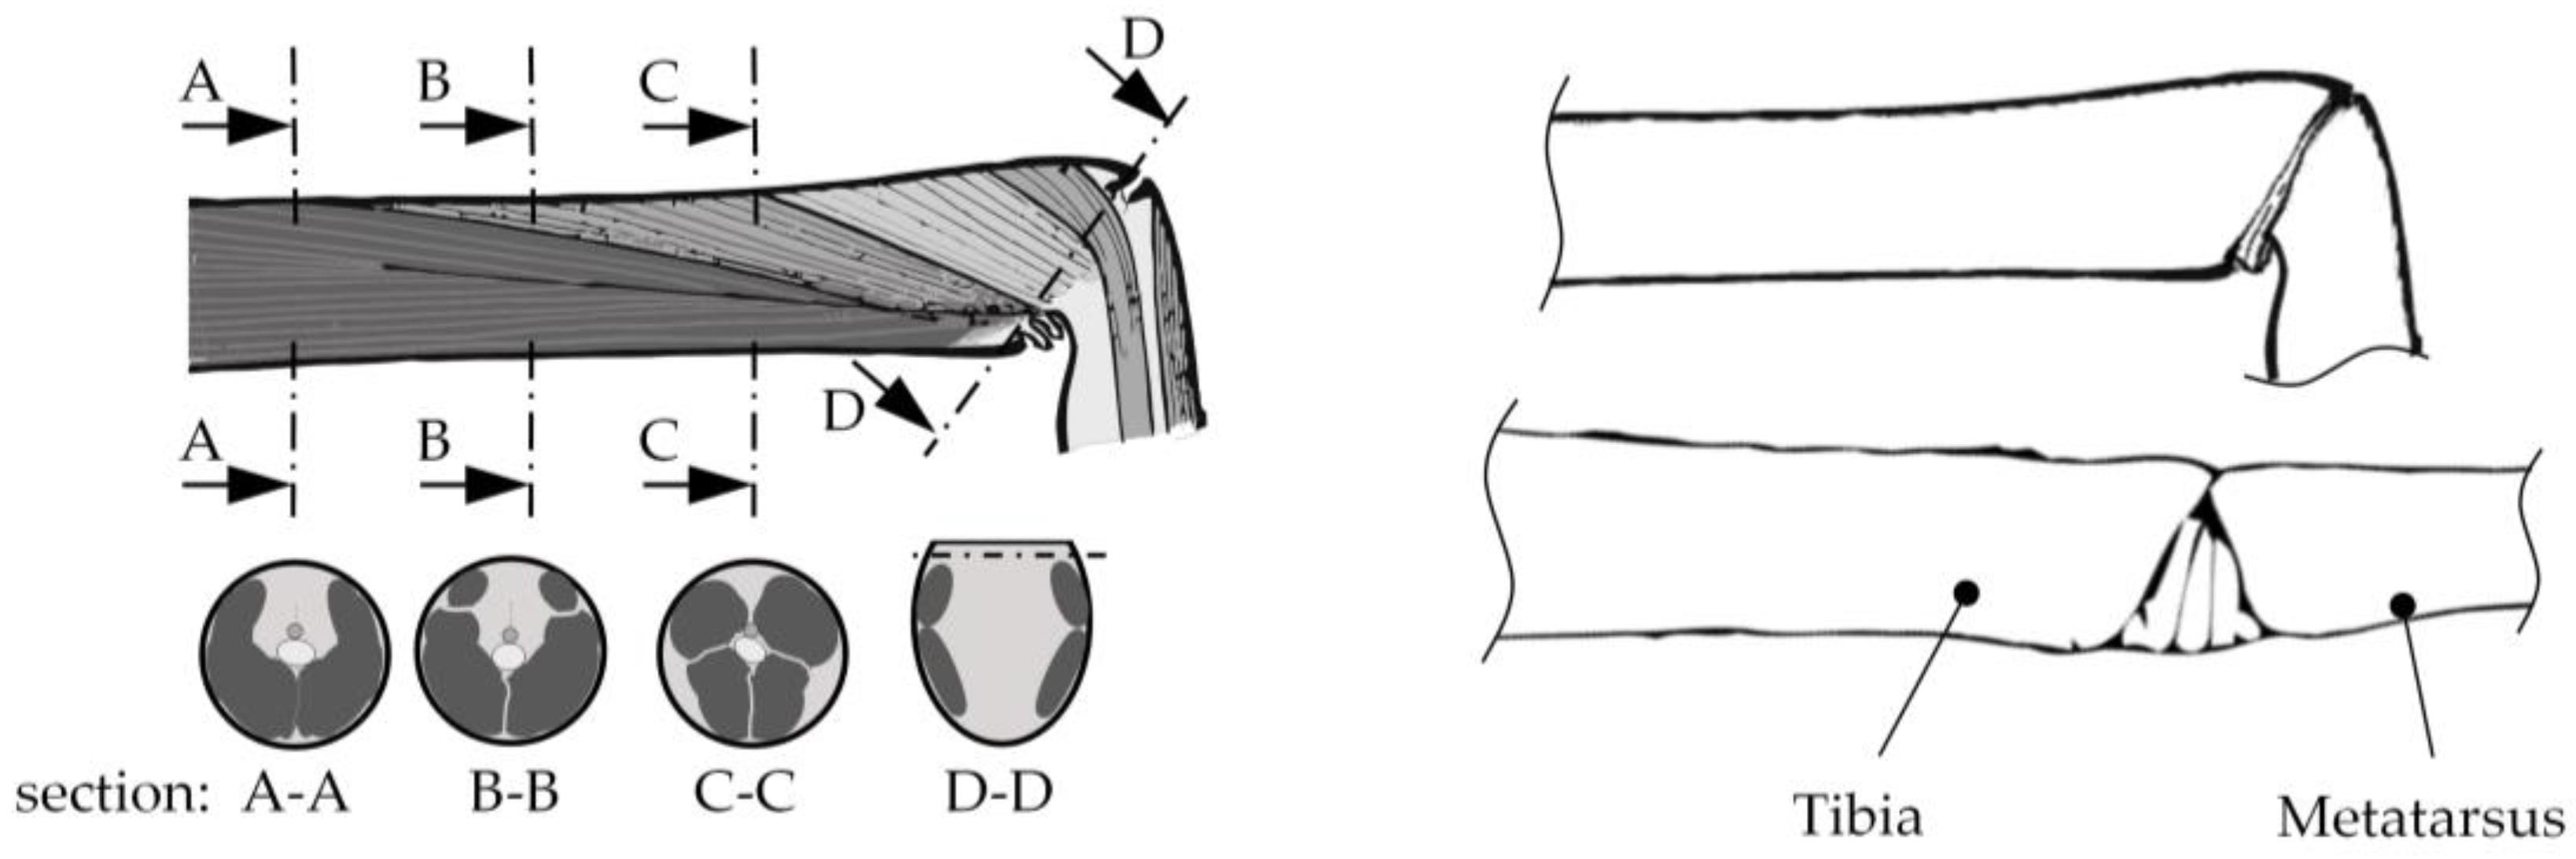 Robotics Free Full Text Biomimetic Spider Leg Joints A